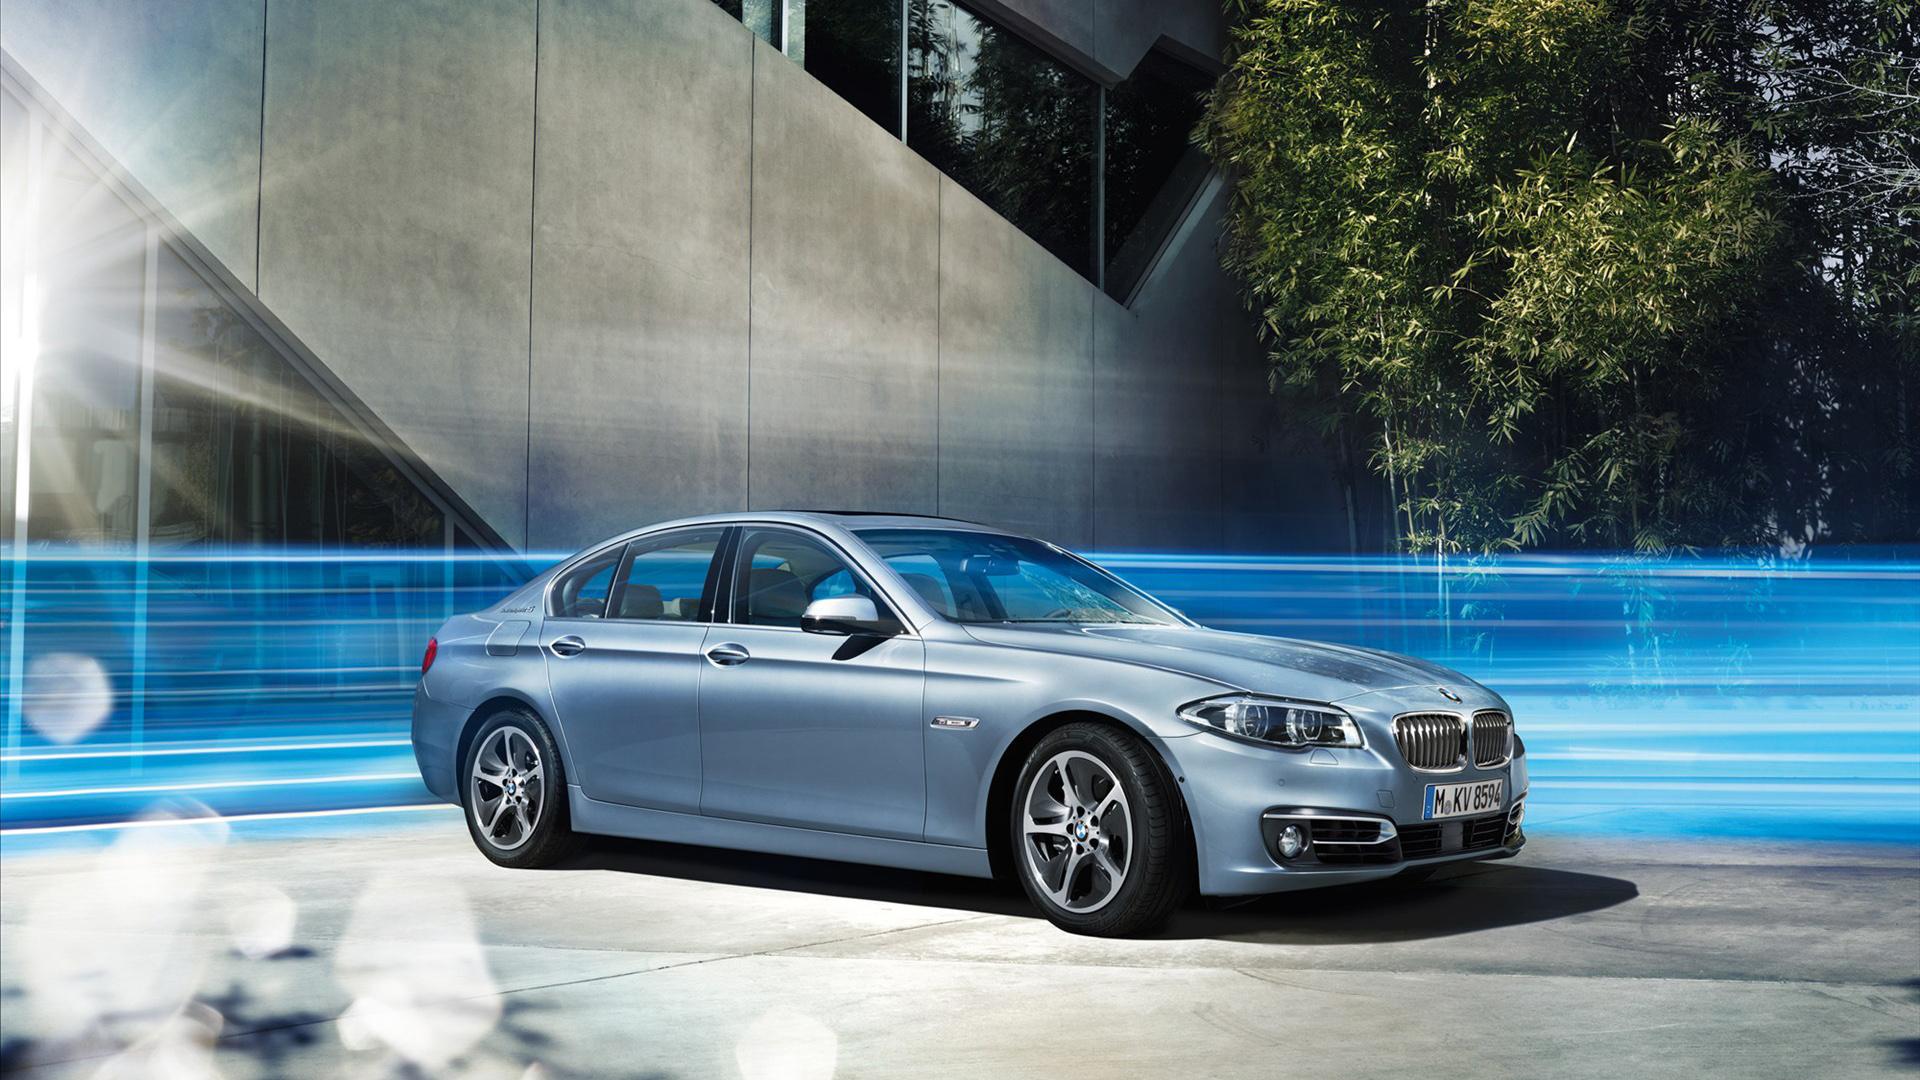 2014 BMW ActiveHybrid 5 Wallpaper | HD Car Wallpapers | ID #3426